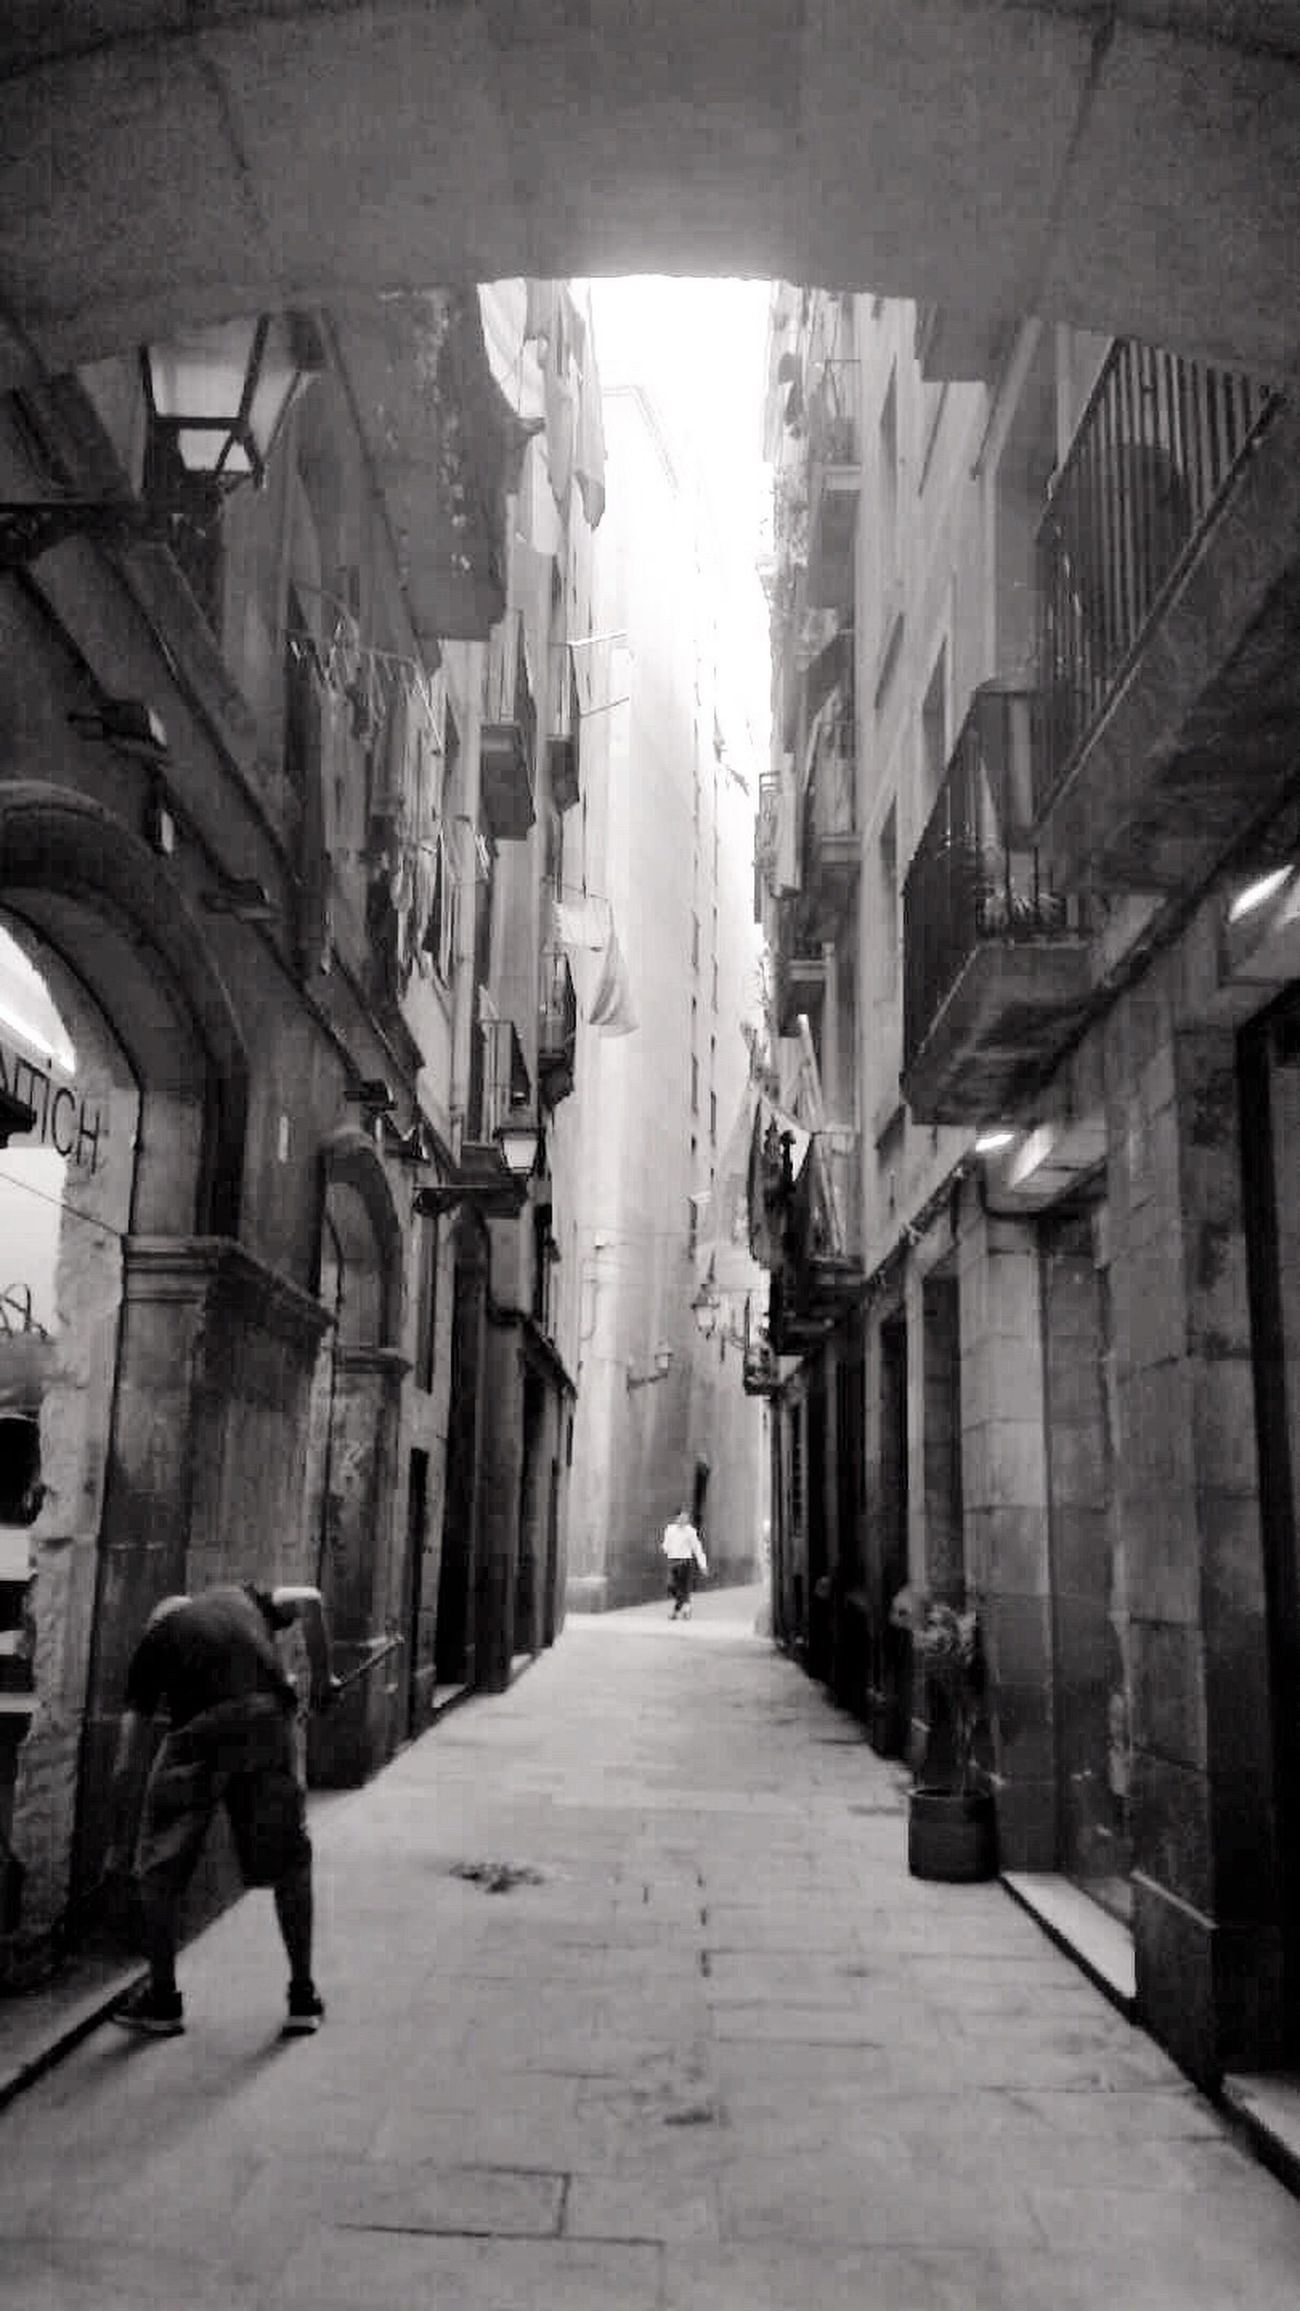 EyeEm Best Shots Eye4photography  Streetphotography Streetphoto_bw Light And Shadow Bw_collection EyeEm Gallery City Life Barcelona The Week On Eyem